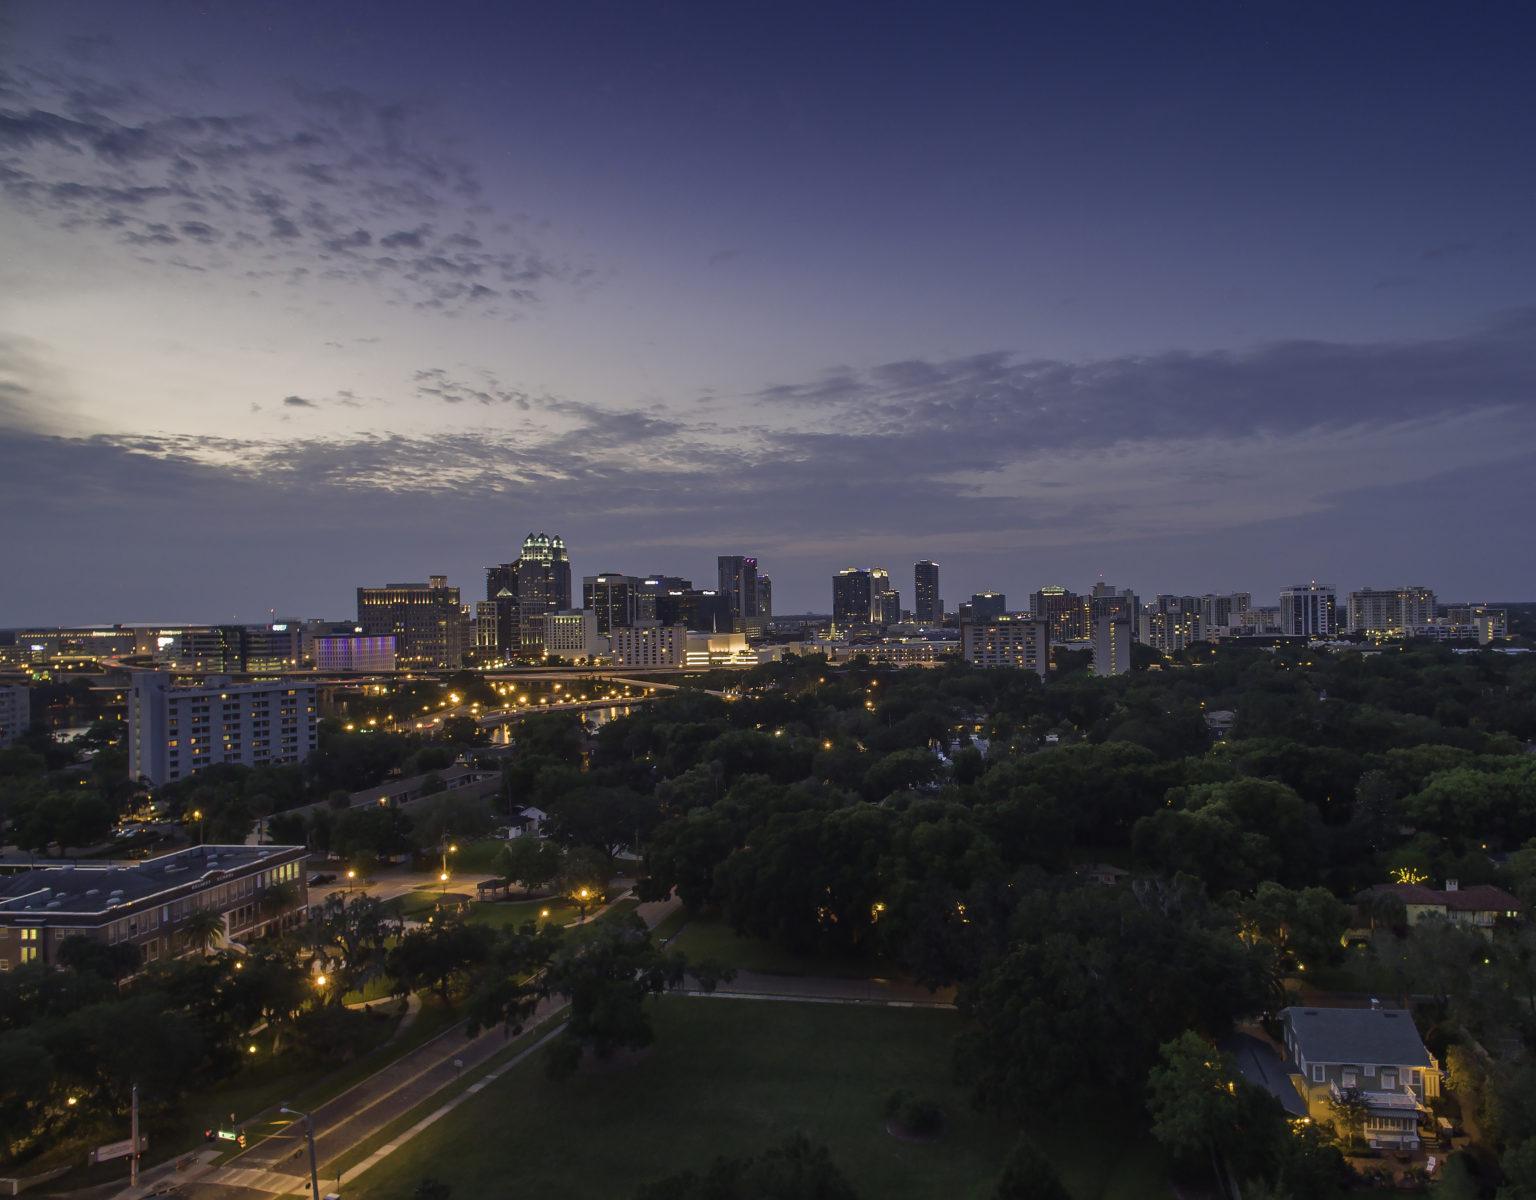 Skyline from Delaney Park